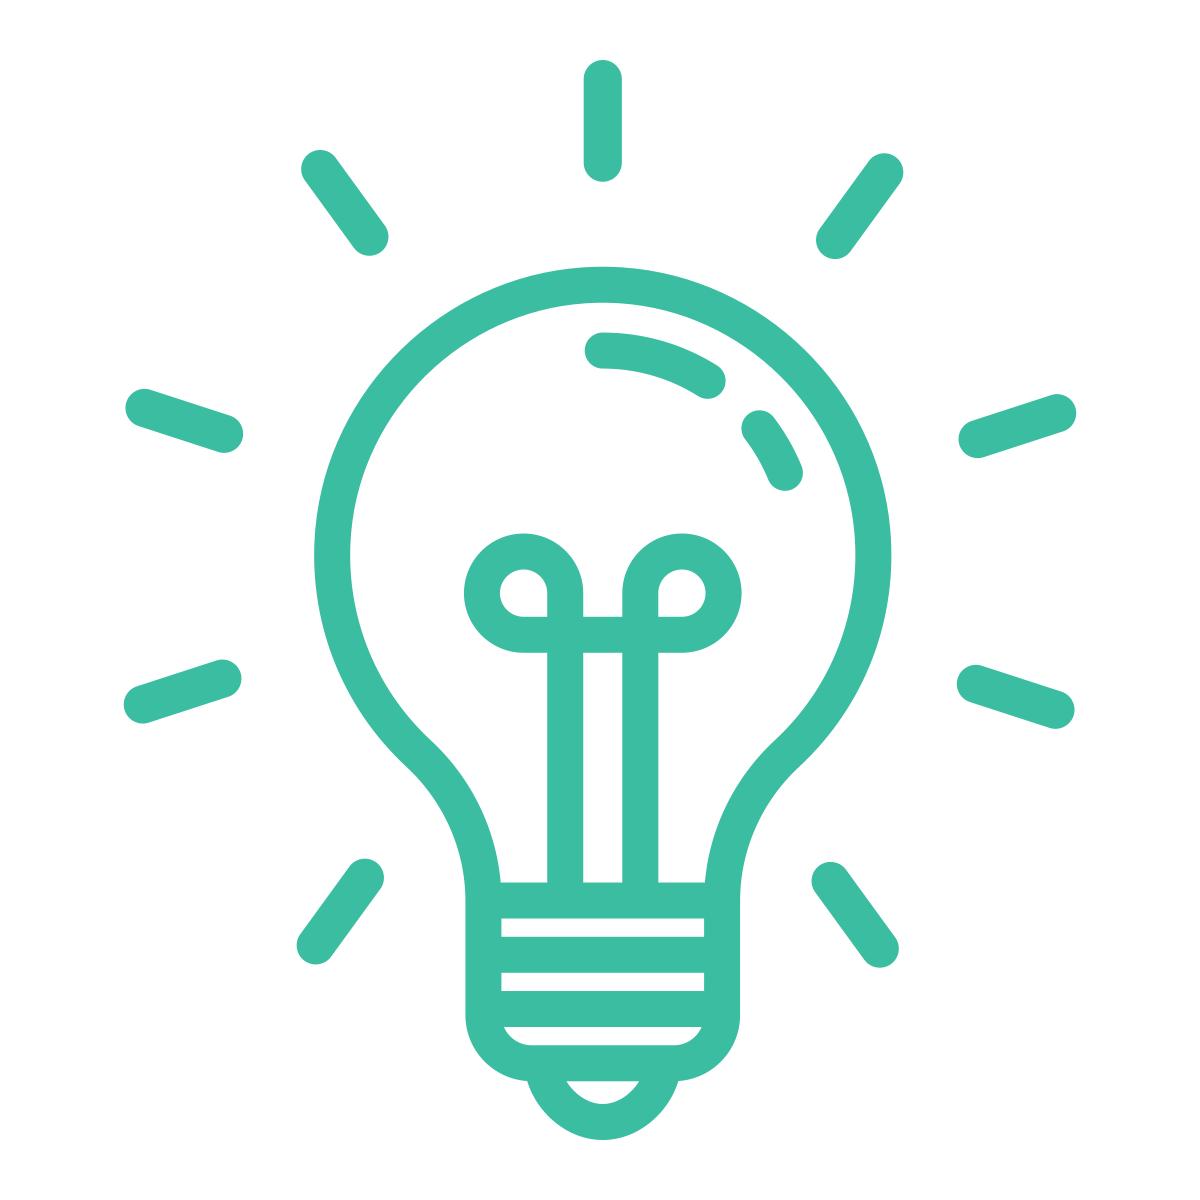 lightbulb - icon